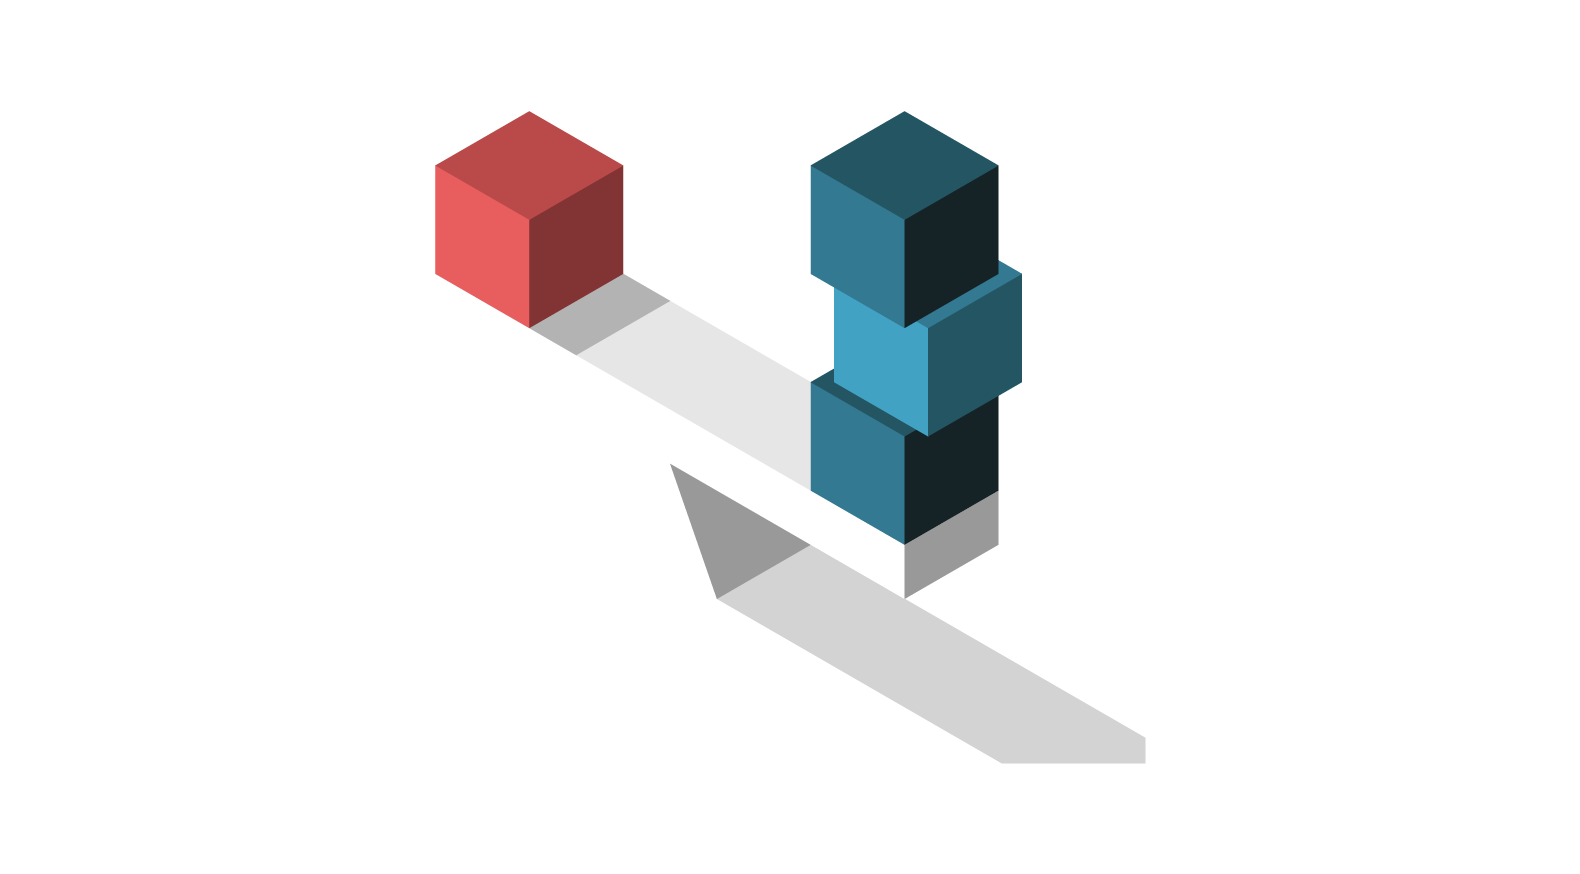 image of blocks balancing on a board